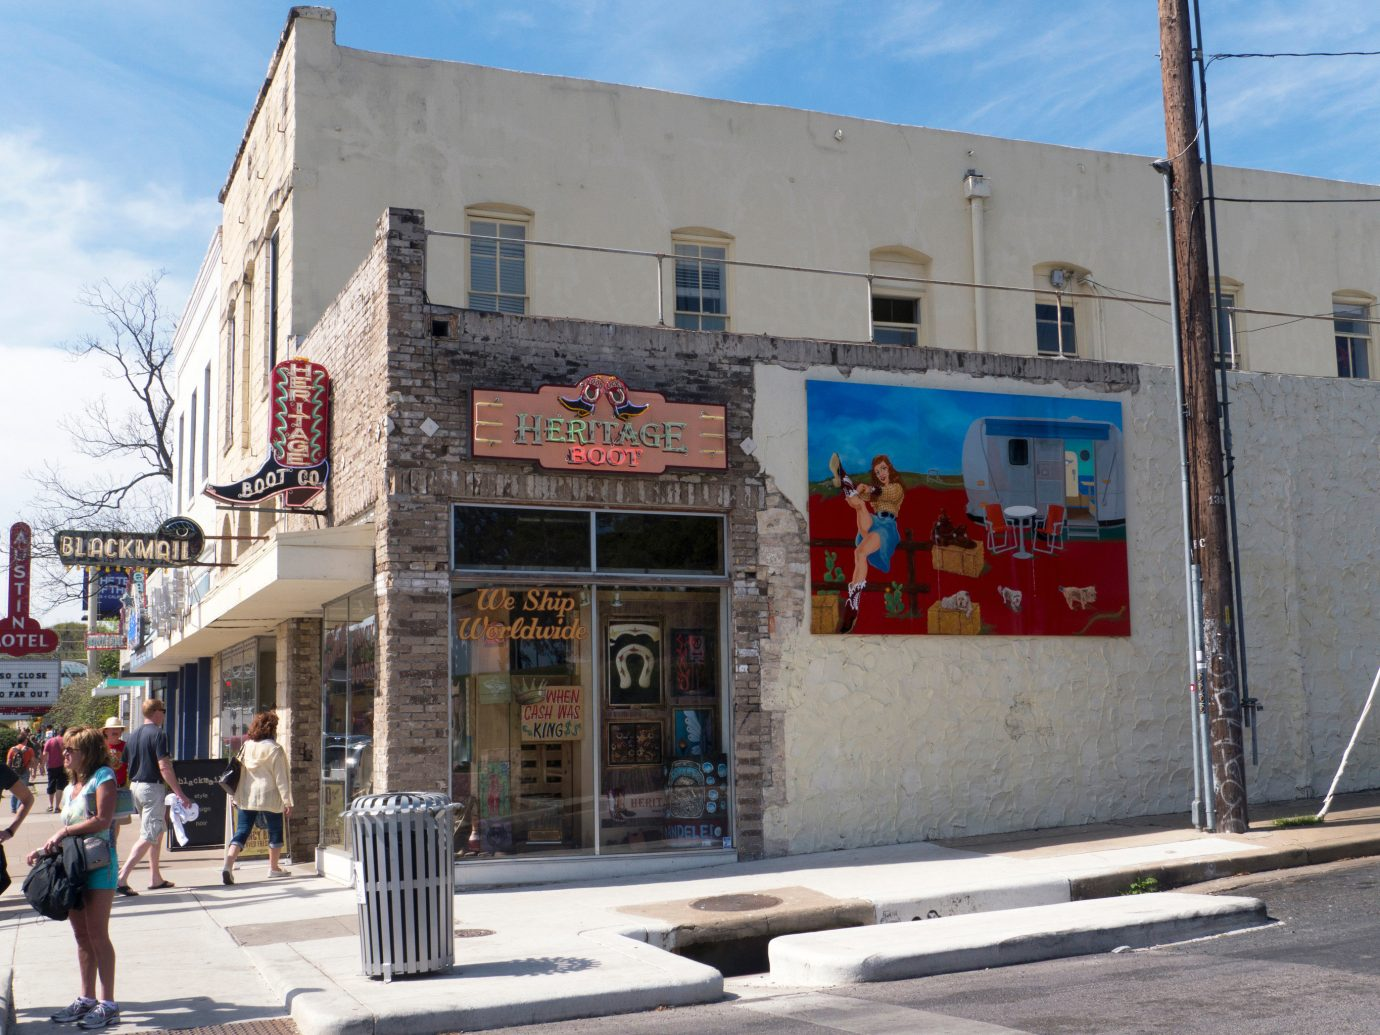 Boot shop in Austin, TX